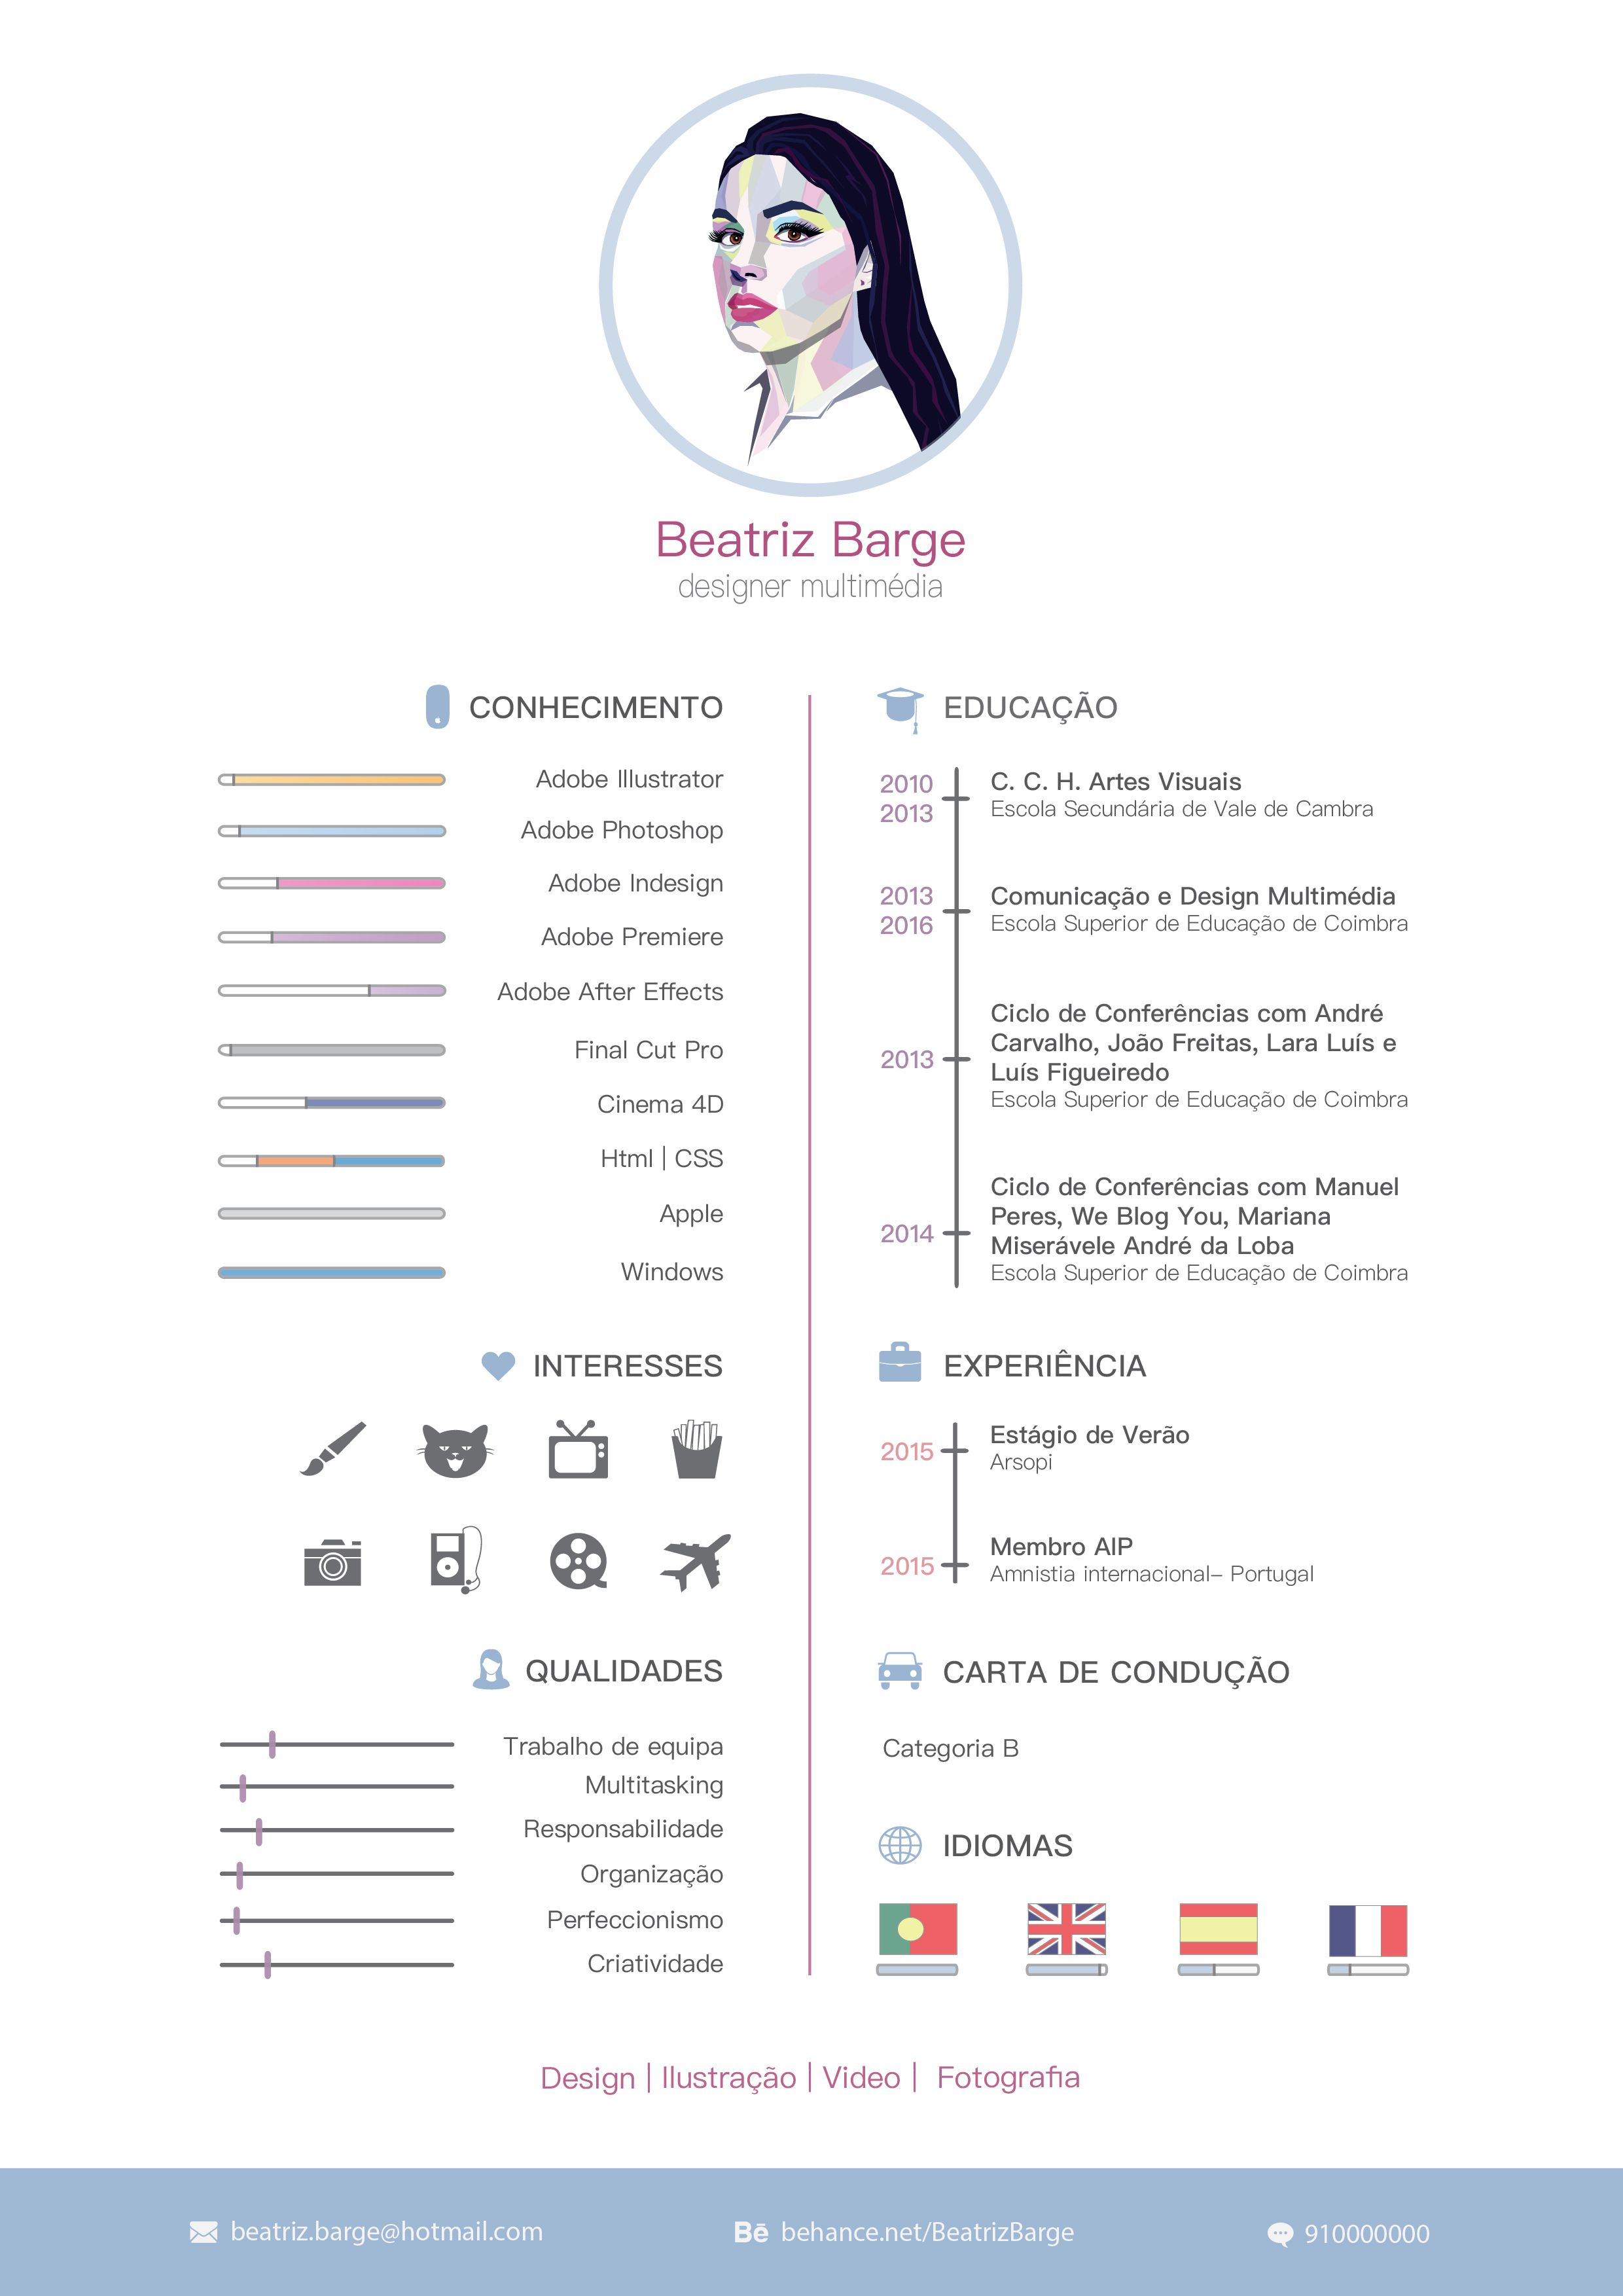 My Curriculum Vitae. 2015 | 포토폴리오 | Pinterest